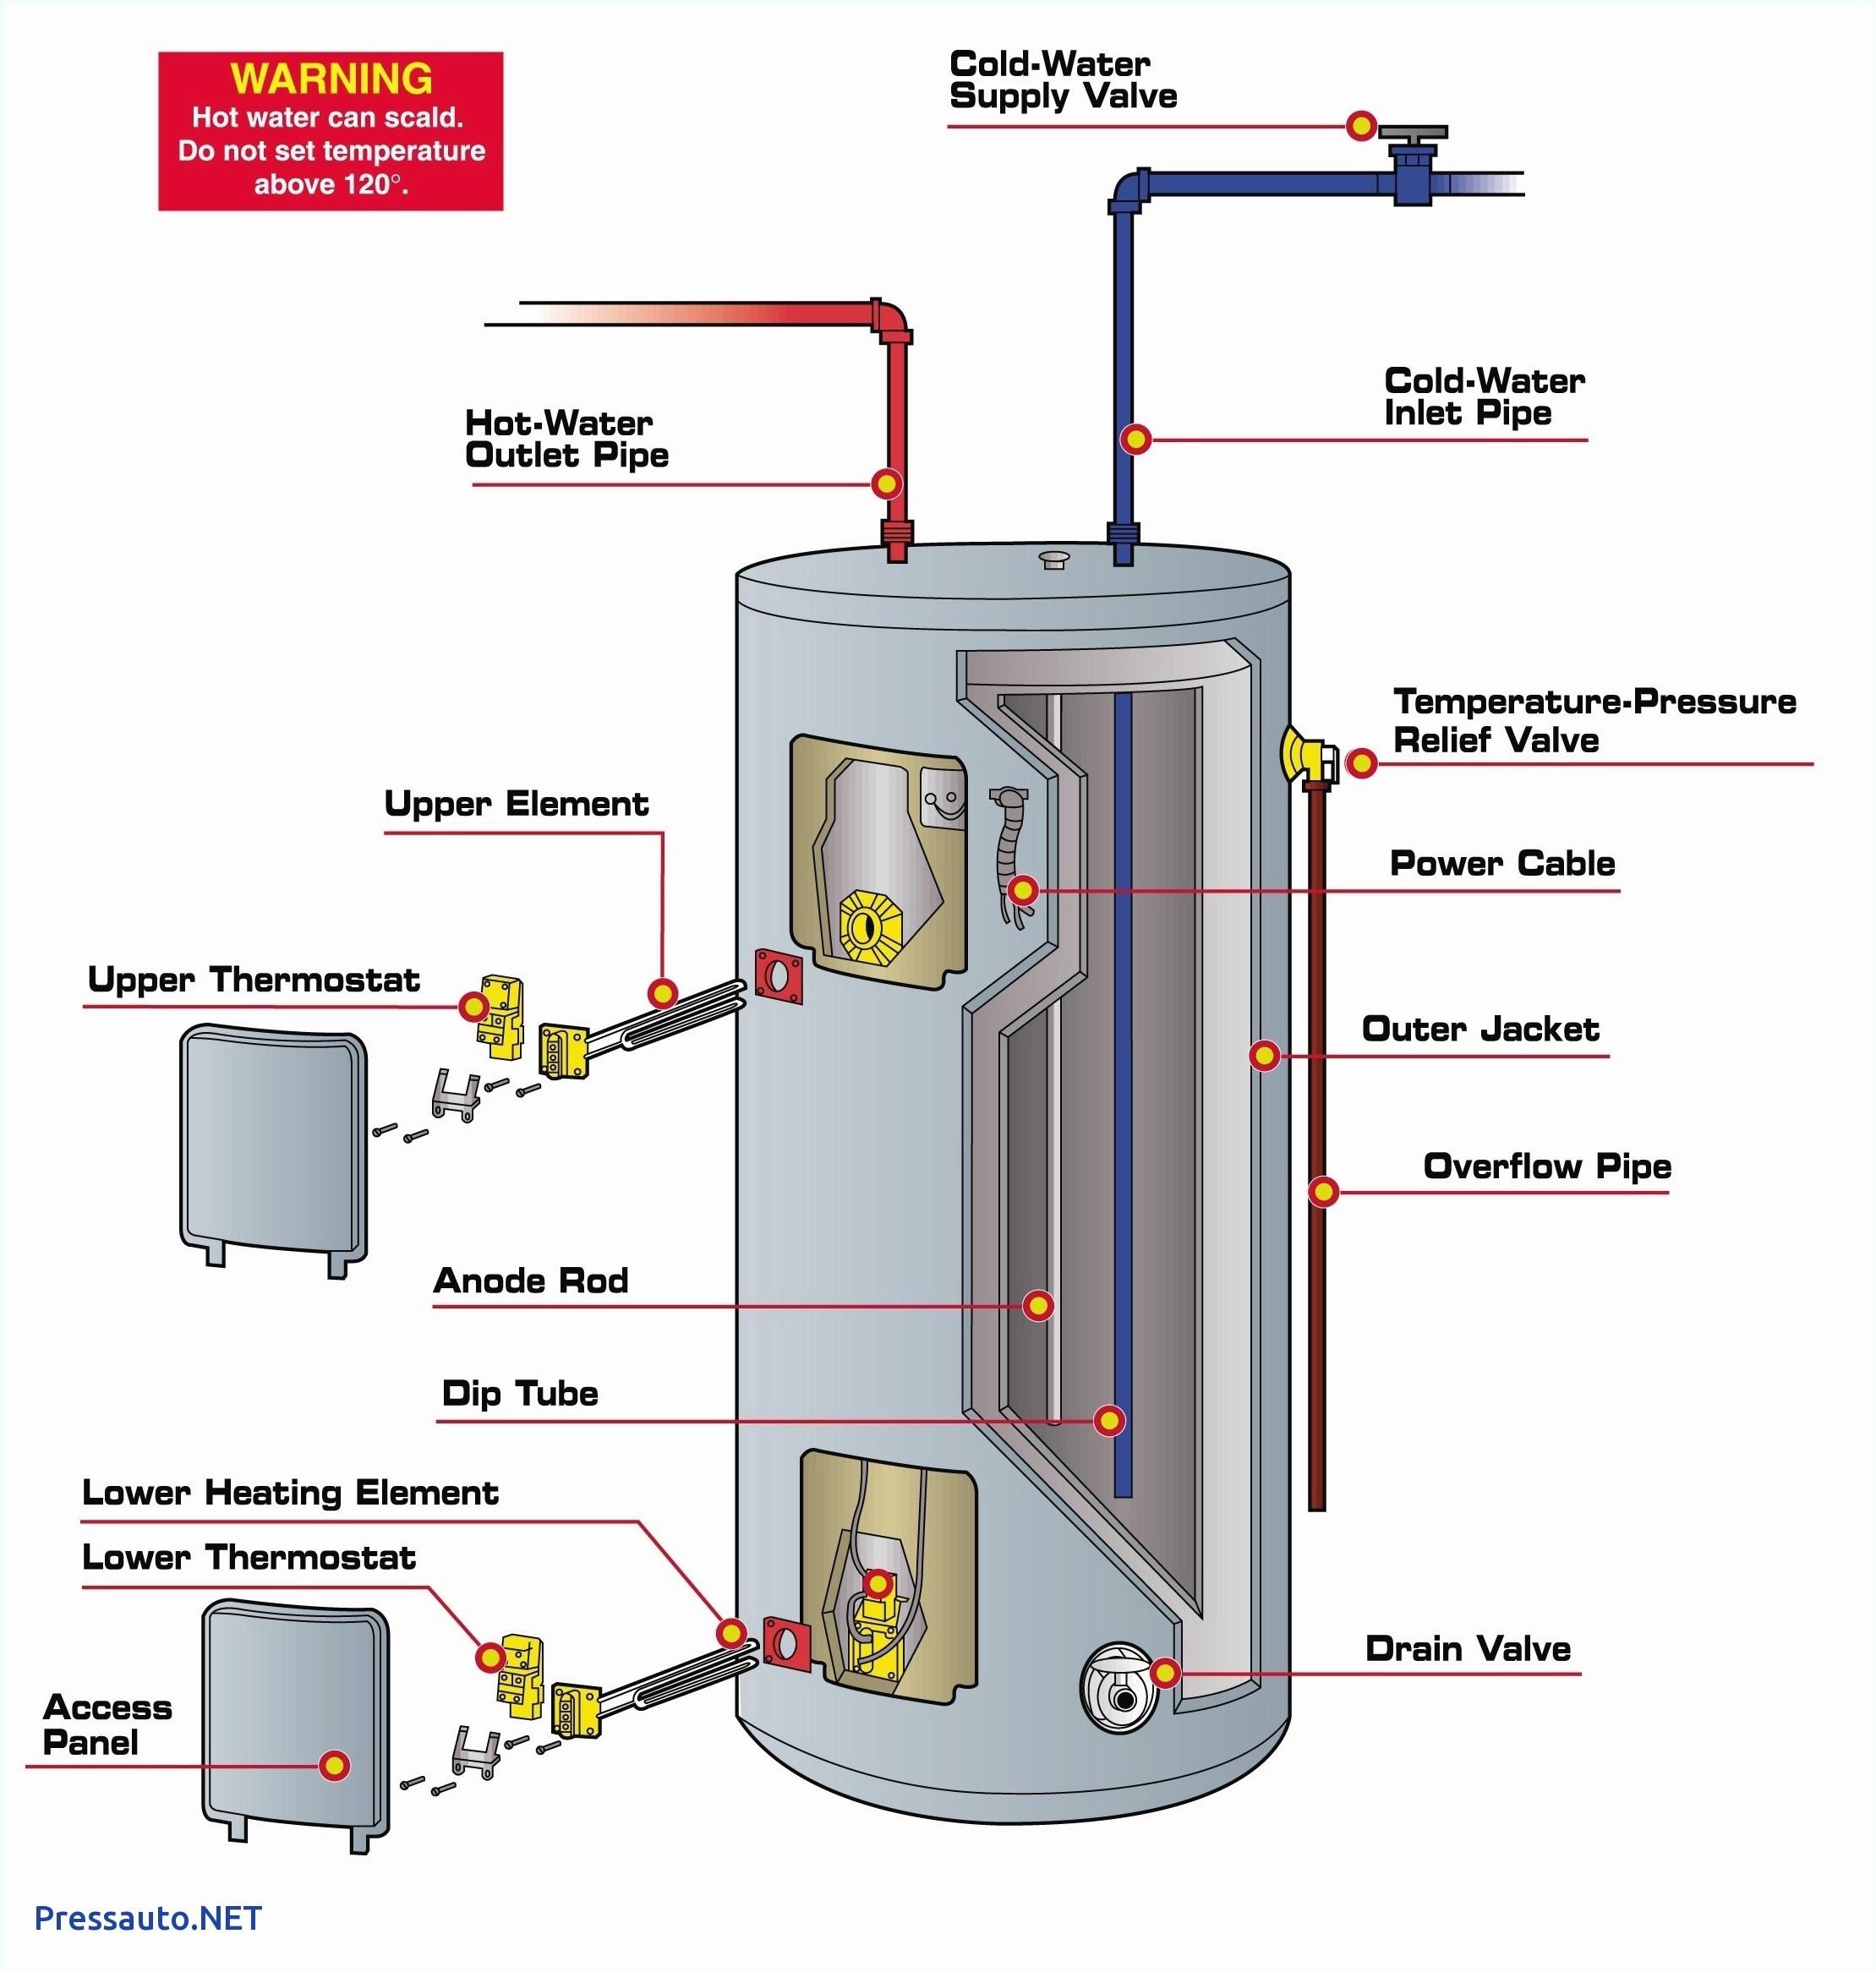 hot schematic wiring diagram wiring diagrams recent hot schematic wiring diagram